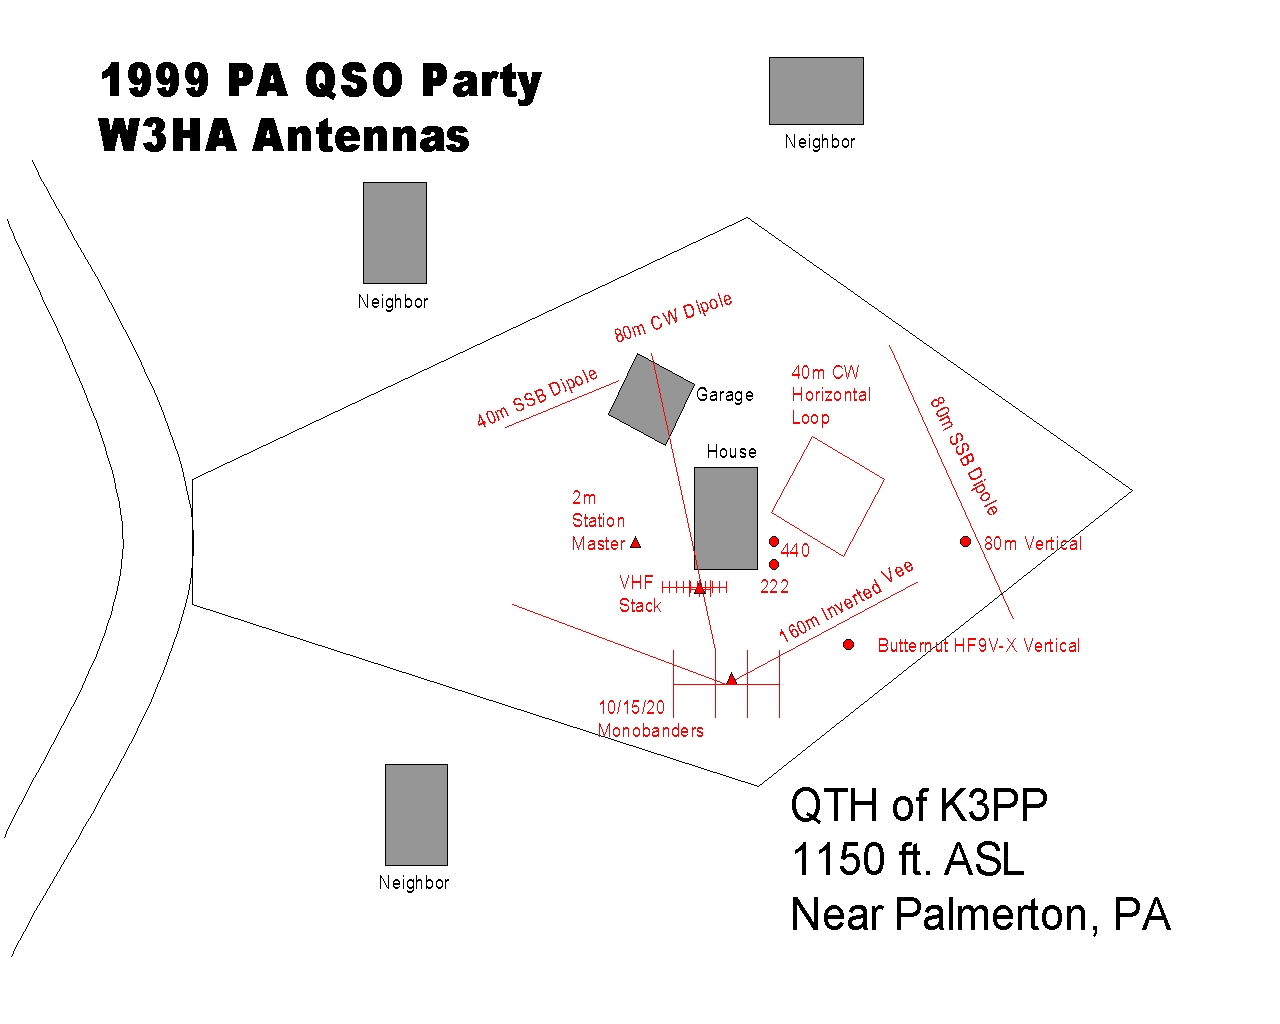 Pennsylvania Qso Party Bonus Station W3ha